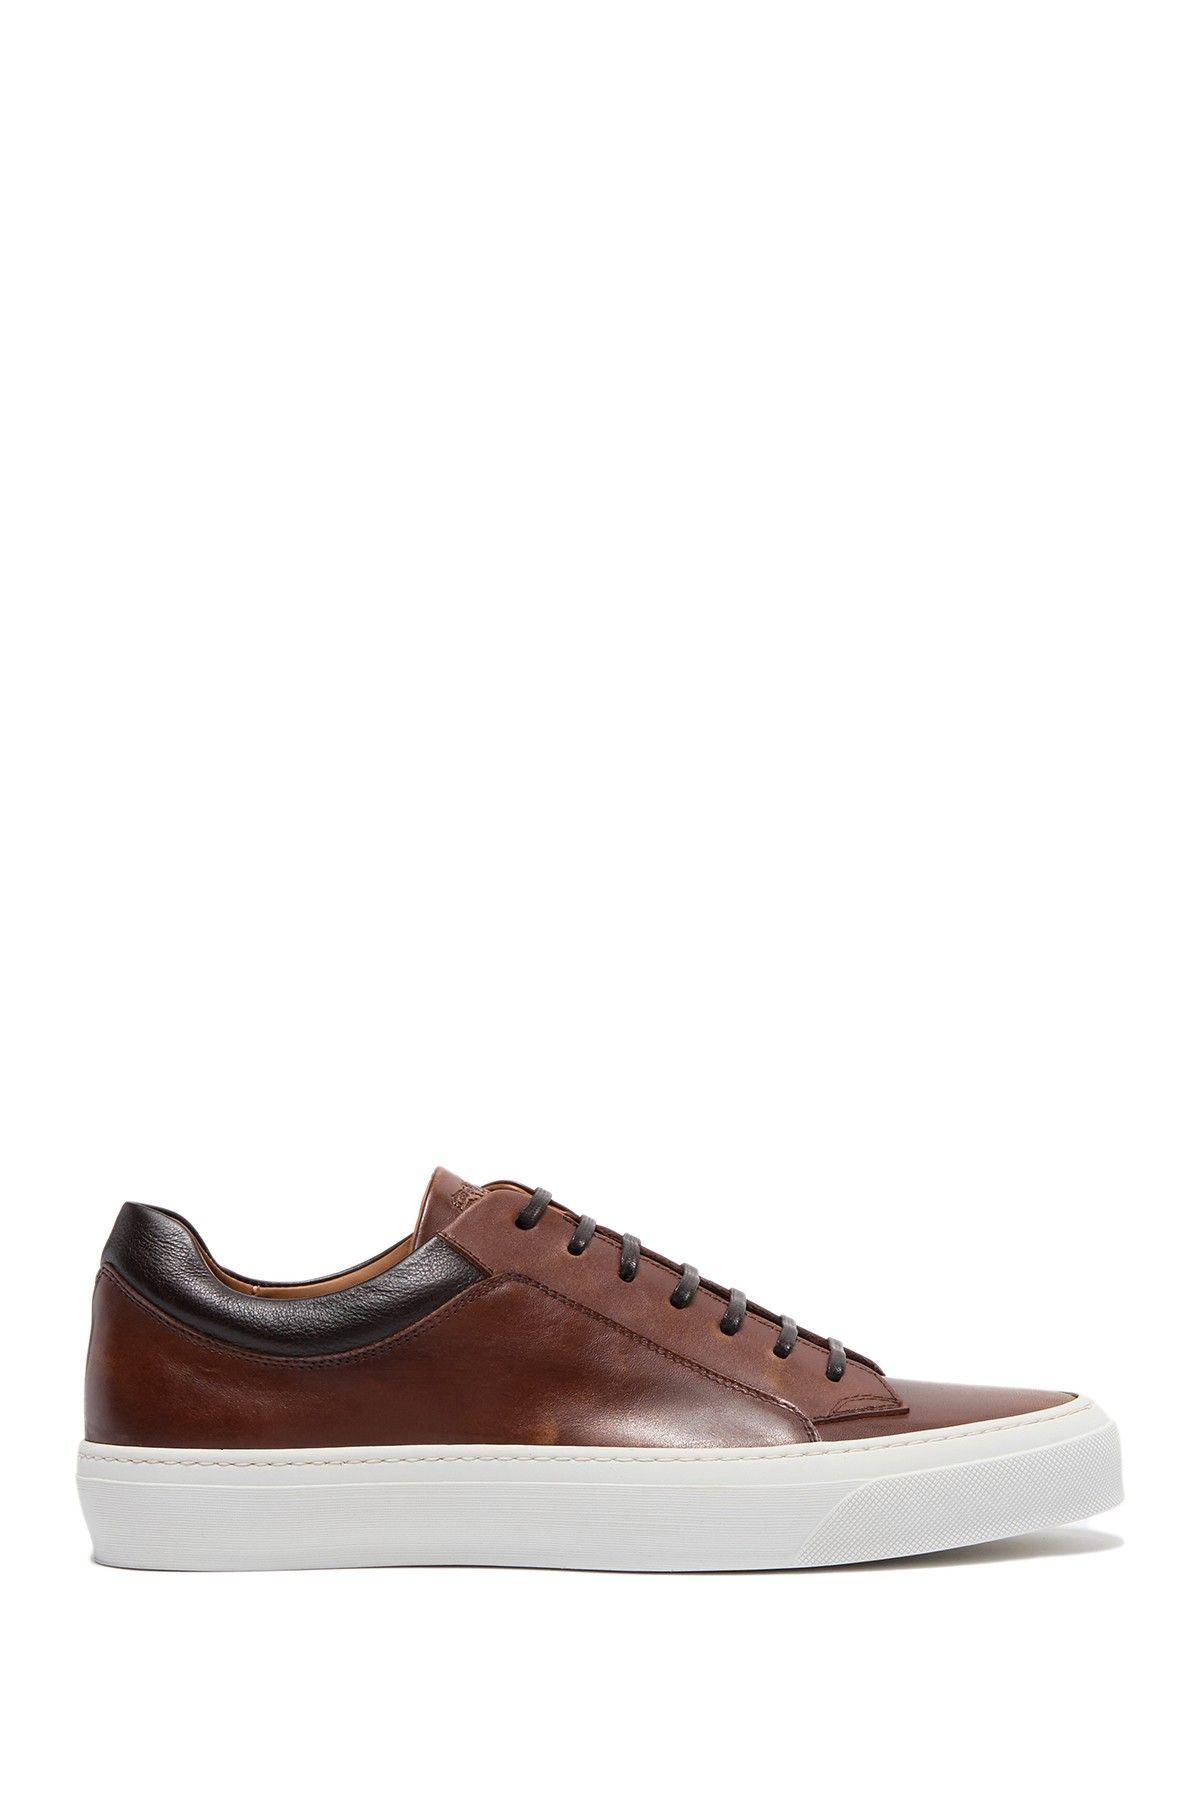 bruno magli leather sneakers